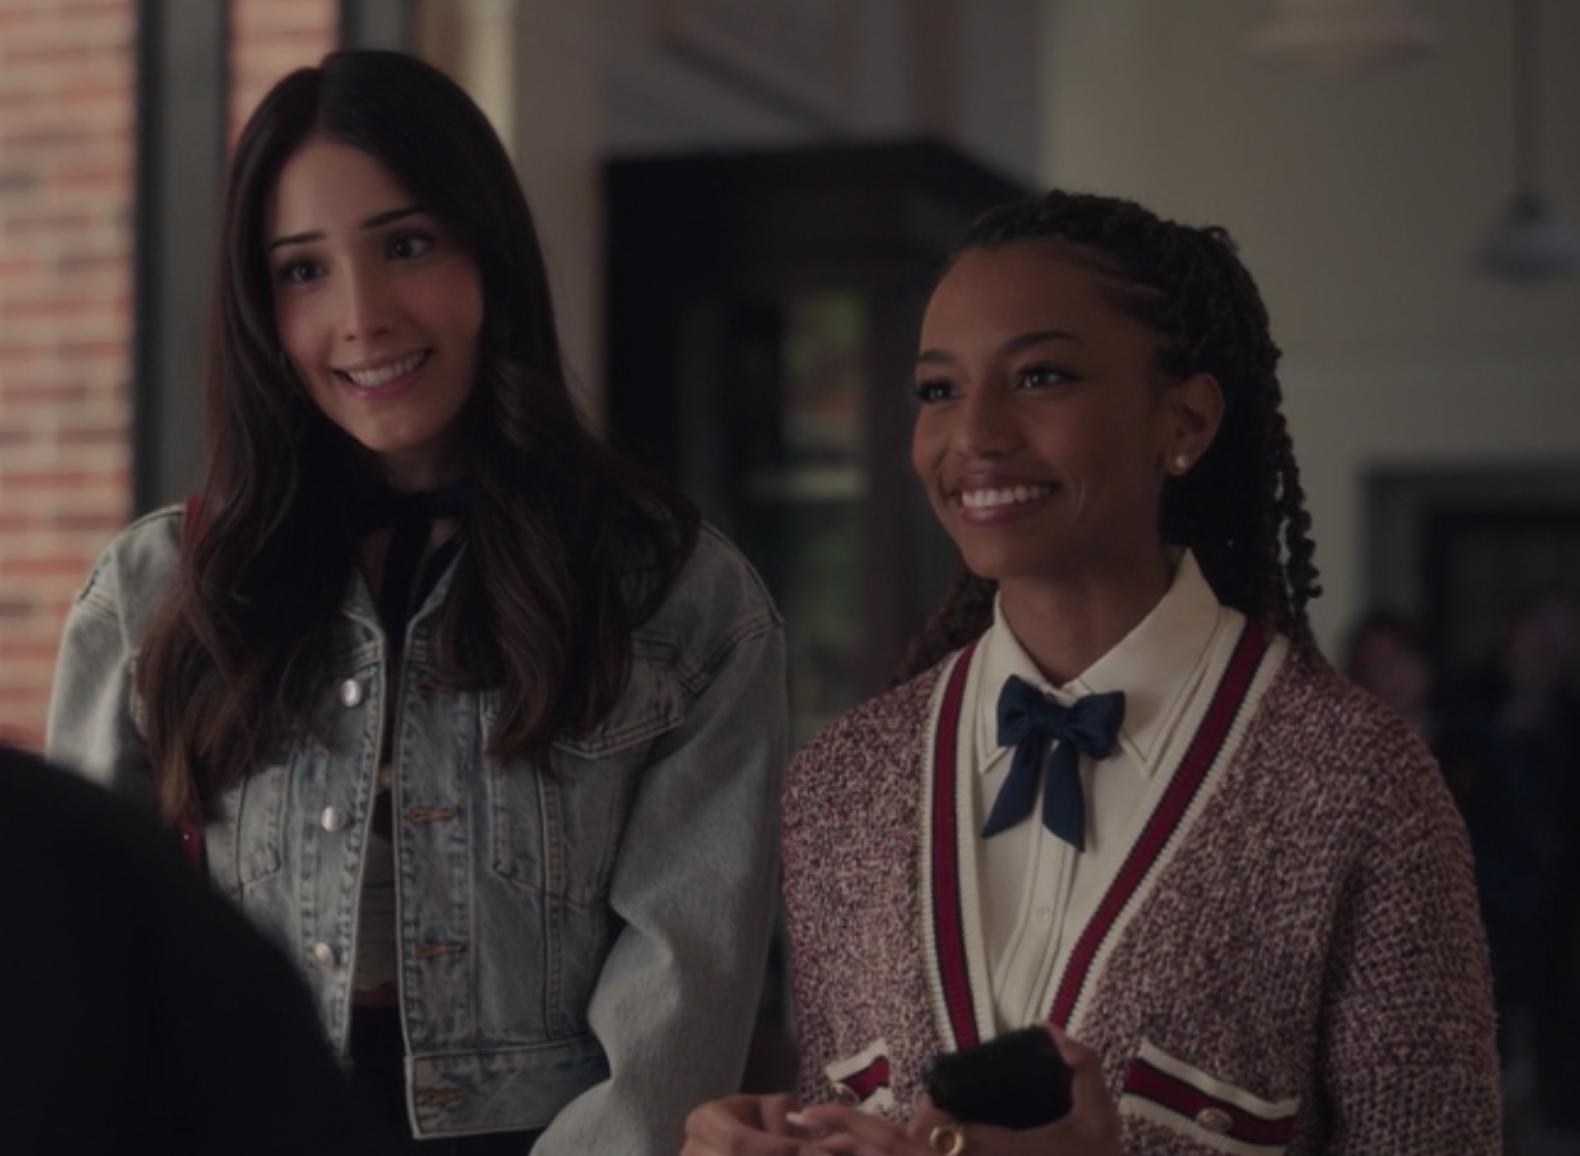 Luna wears a cropped denim jacket and Monet wears an oversized knit cardigan.